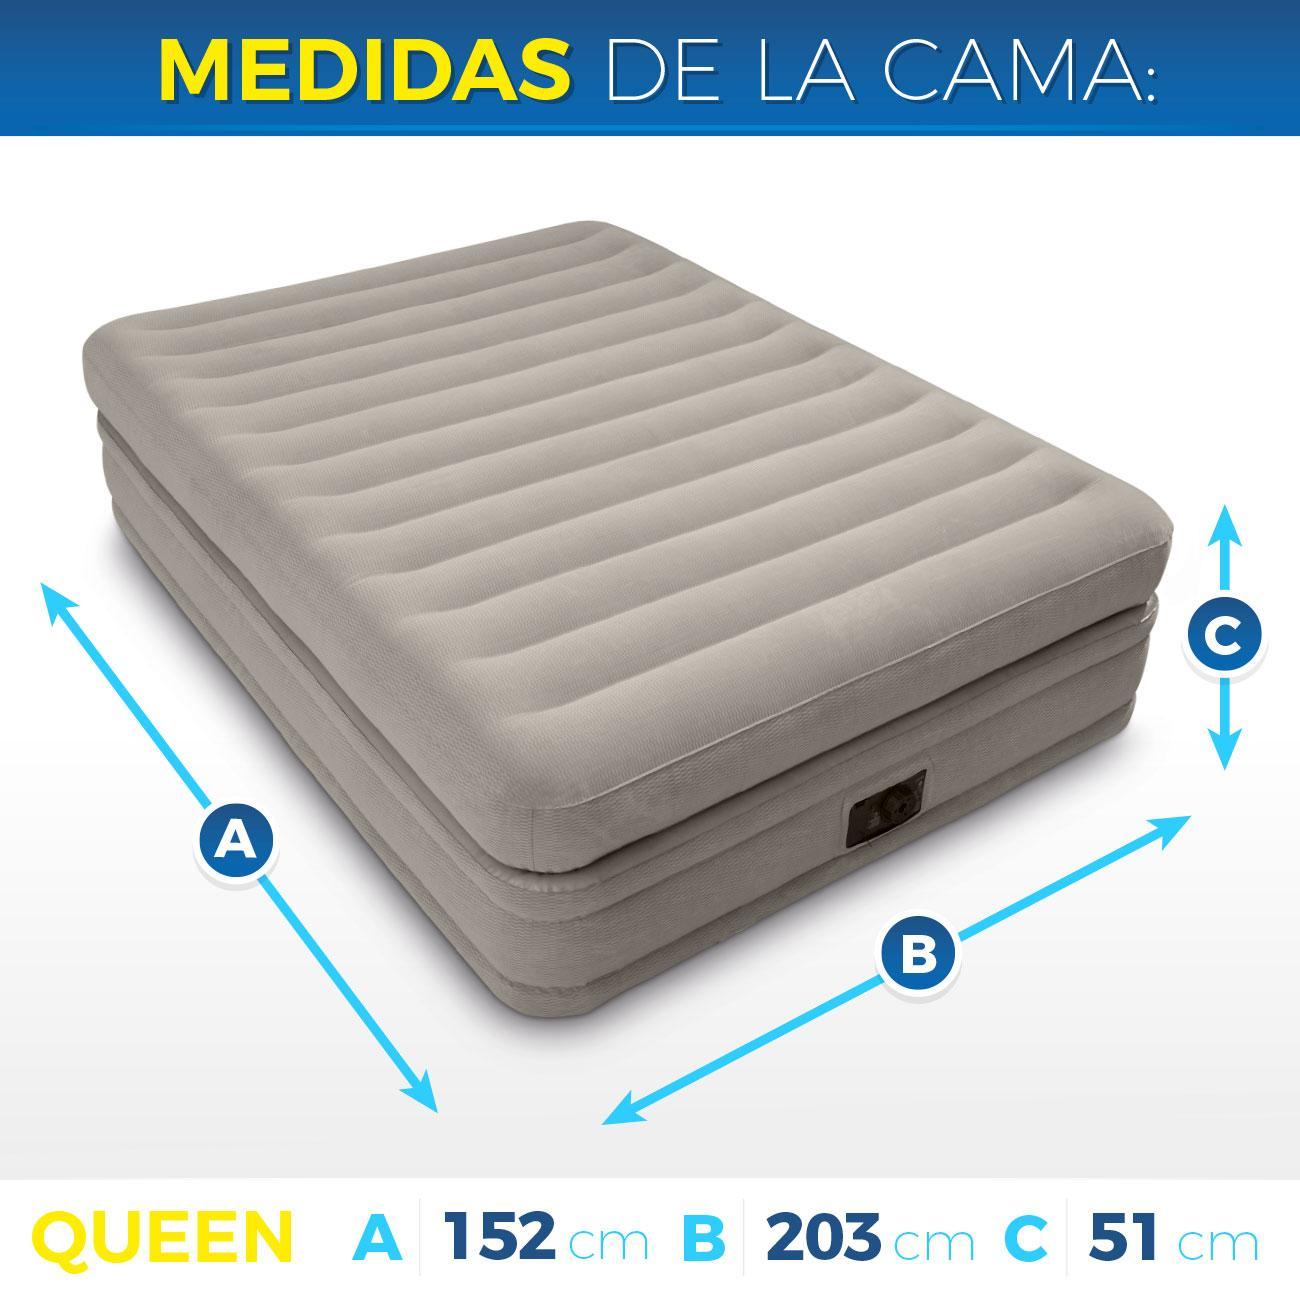 Intex colch n hinchable intex fibertech doble capa for Medidas colchon cama sencilla